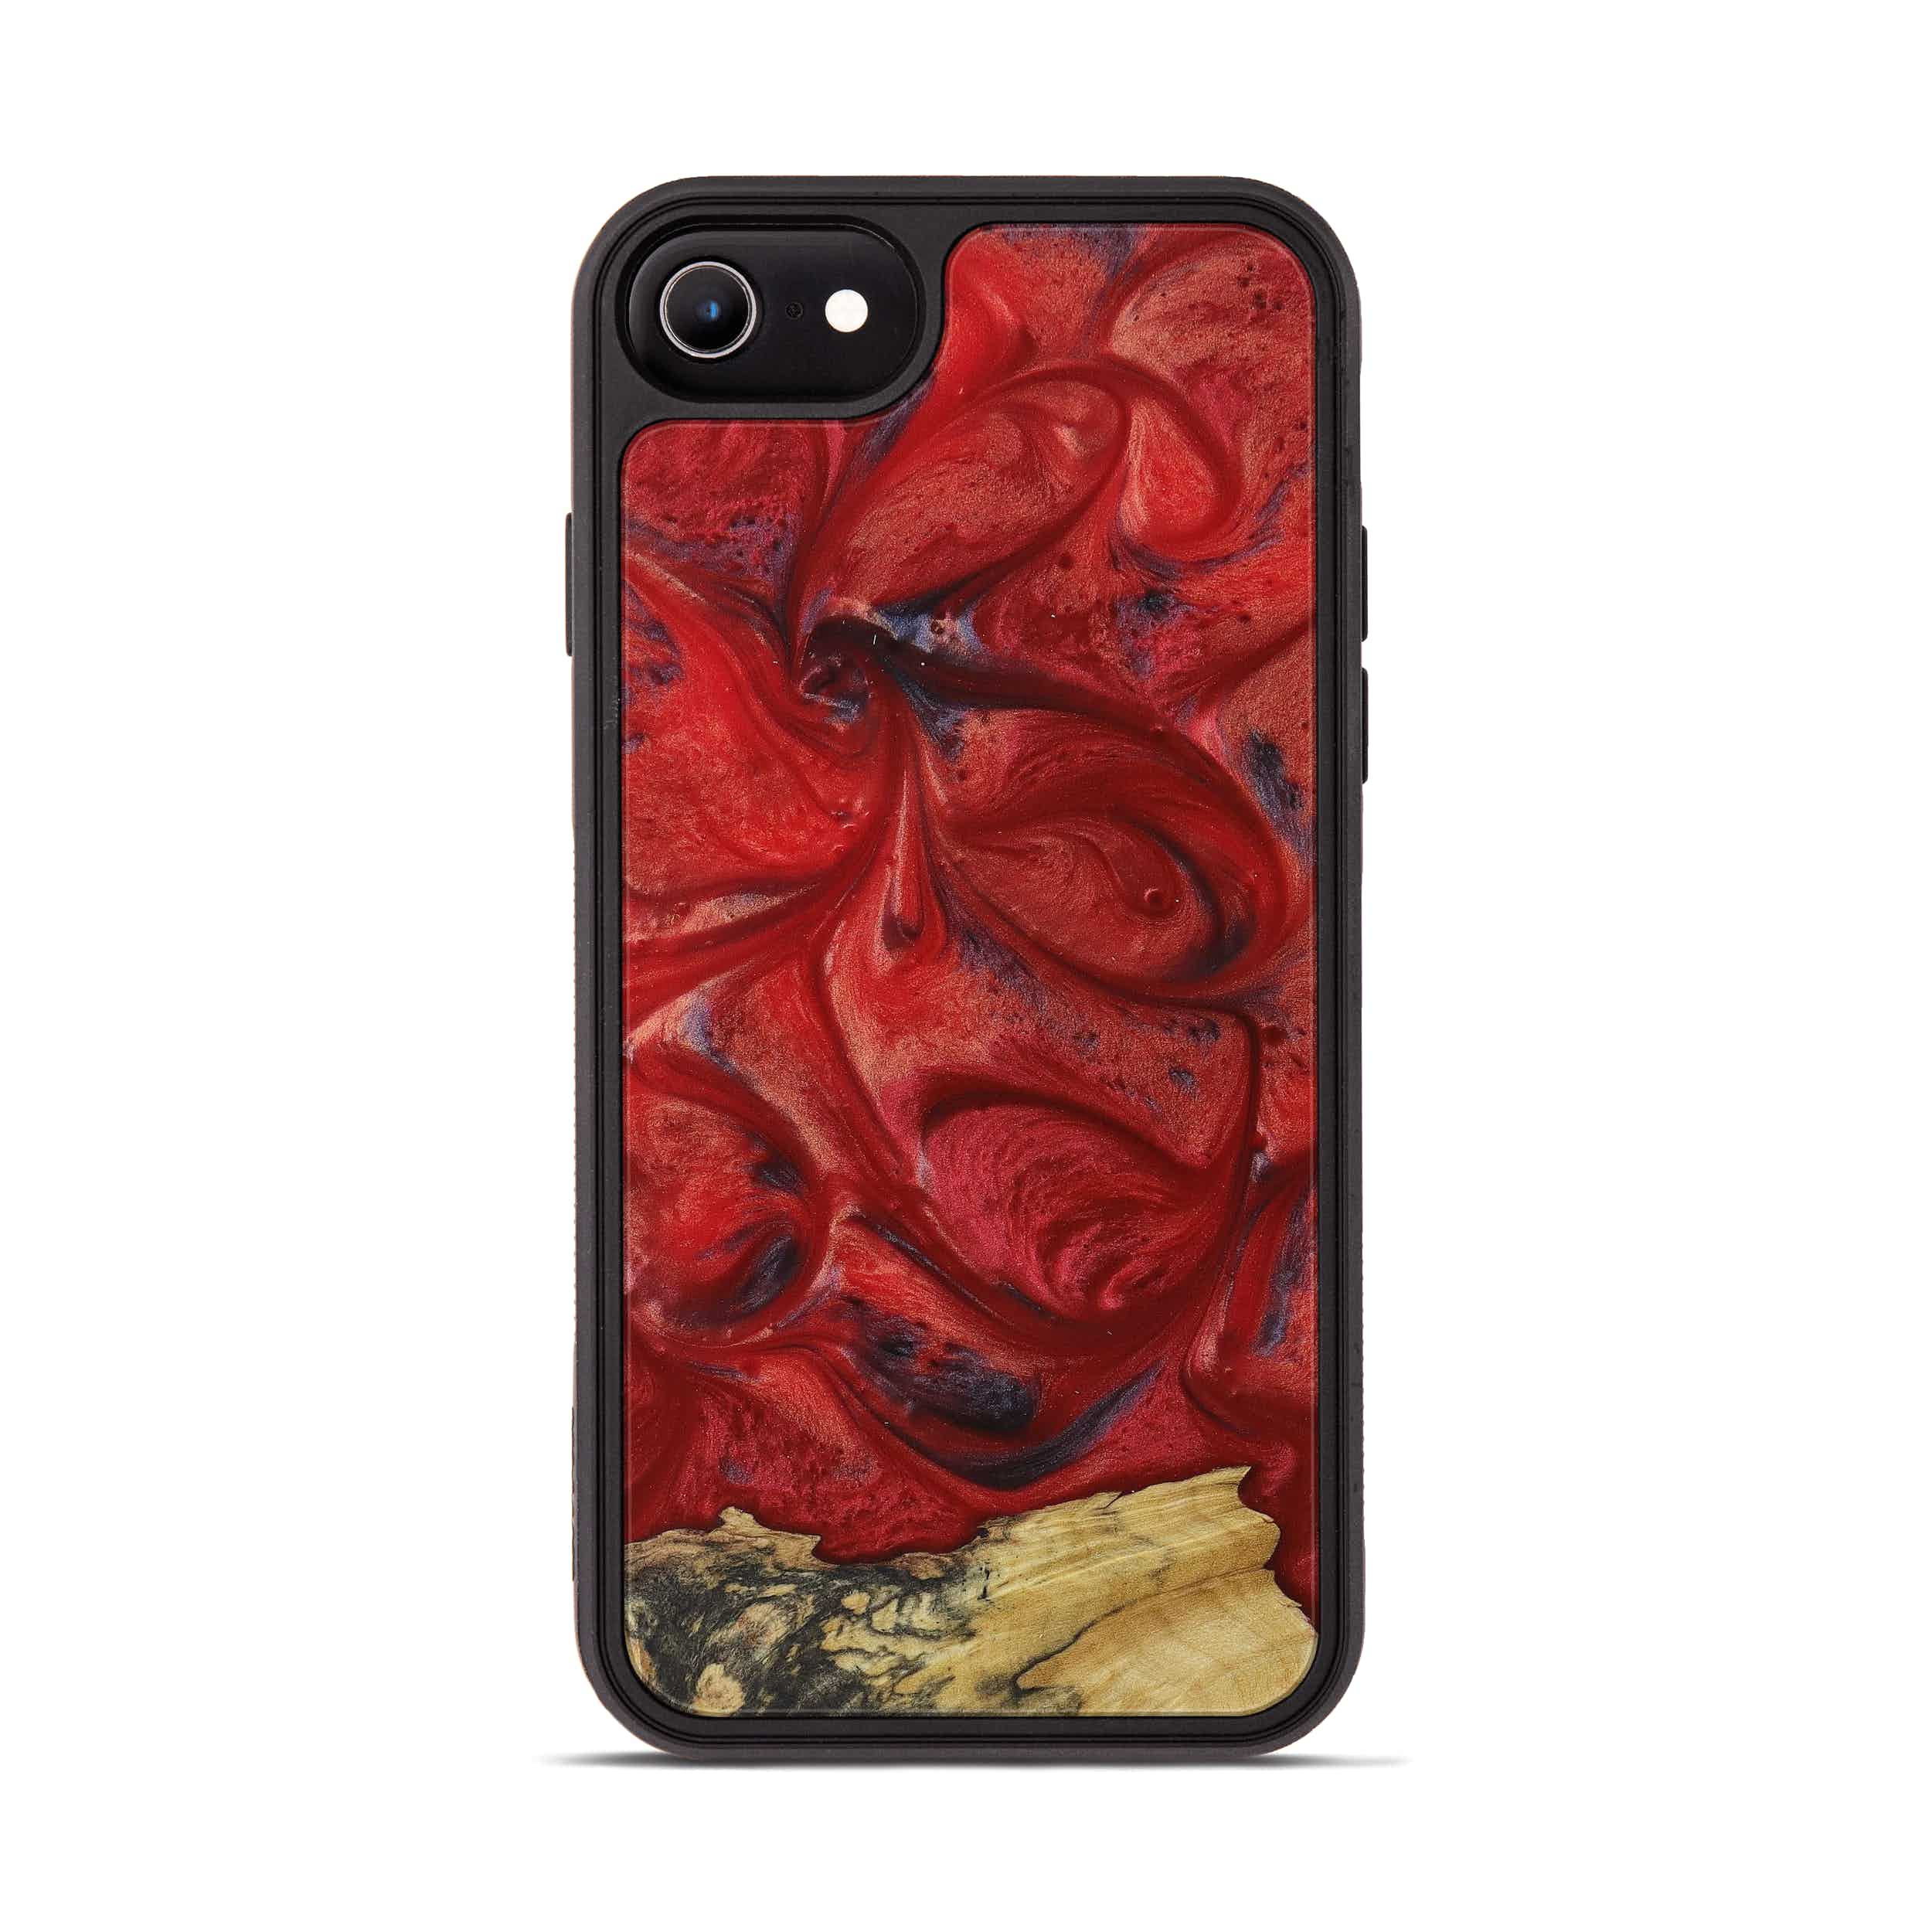 iPhone 6s Wood+Resin Phone Case - Tobe (Dark Red, 395204)